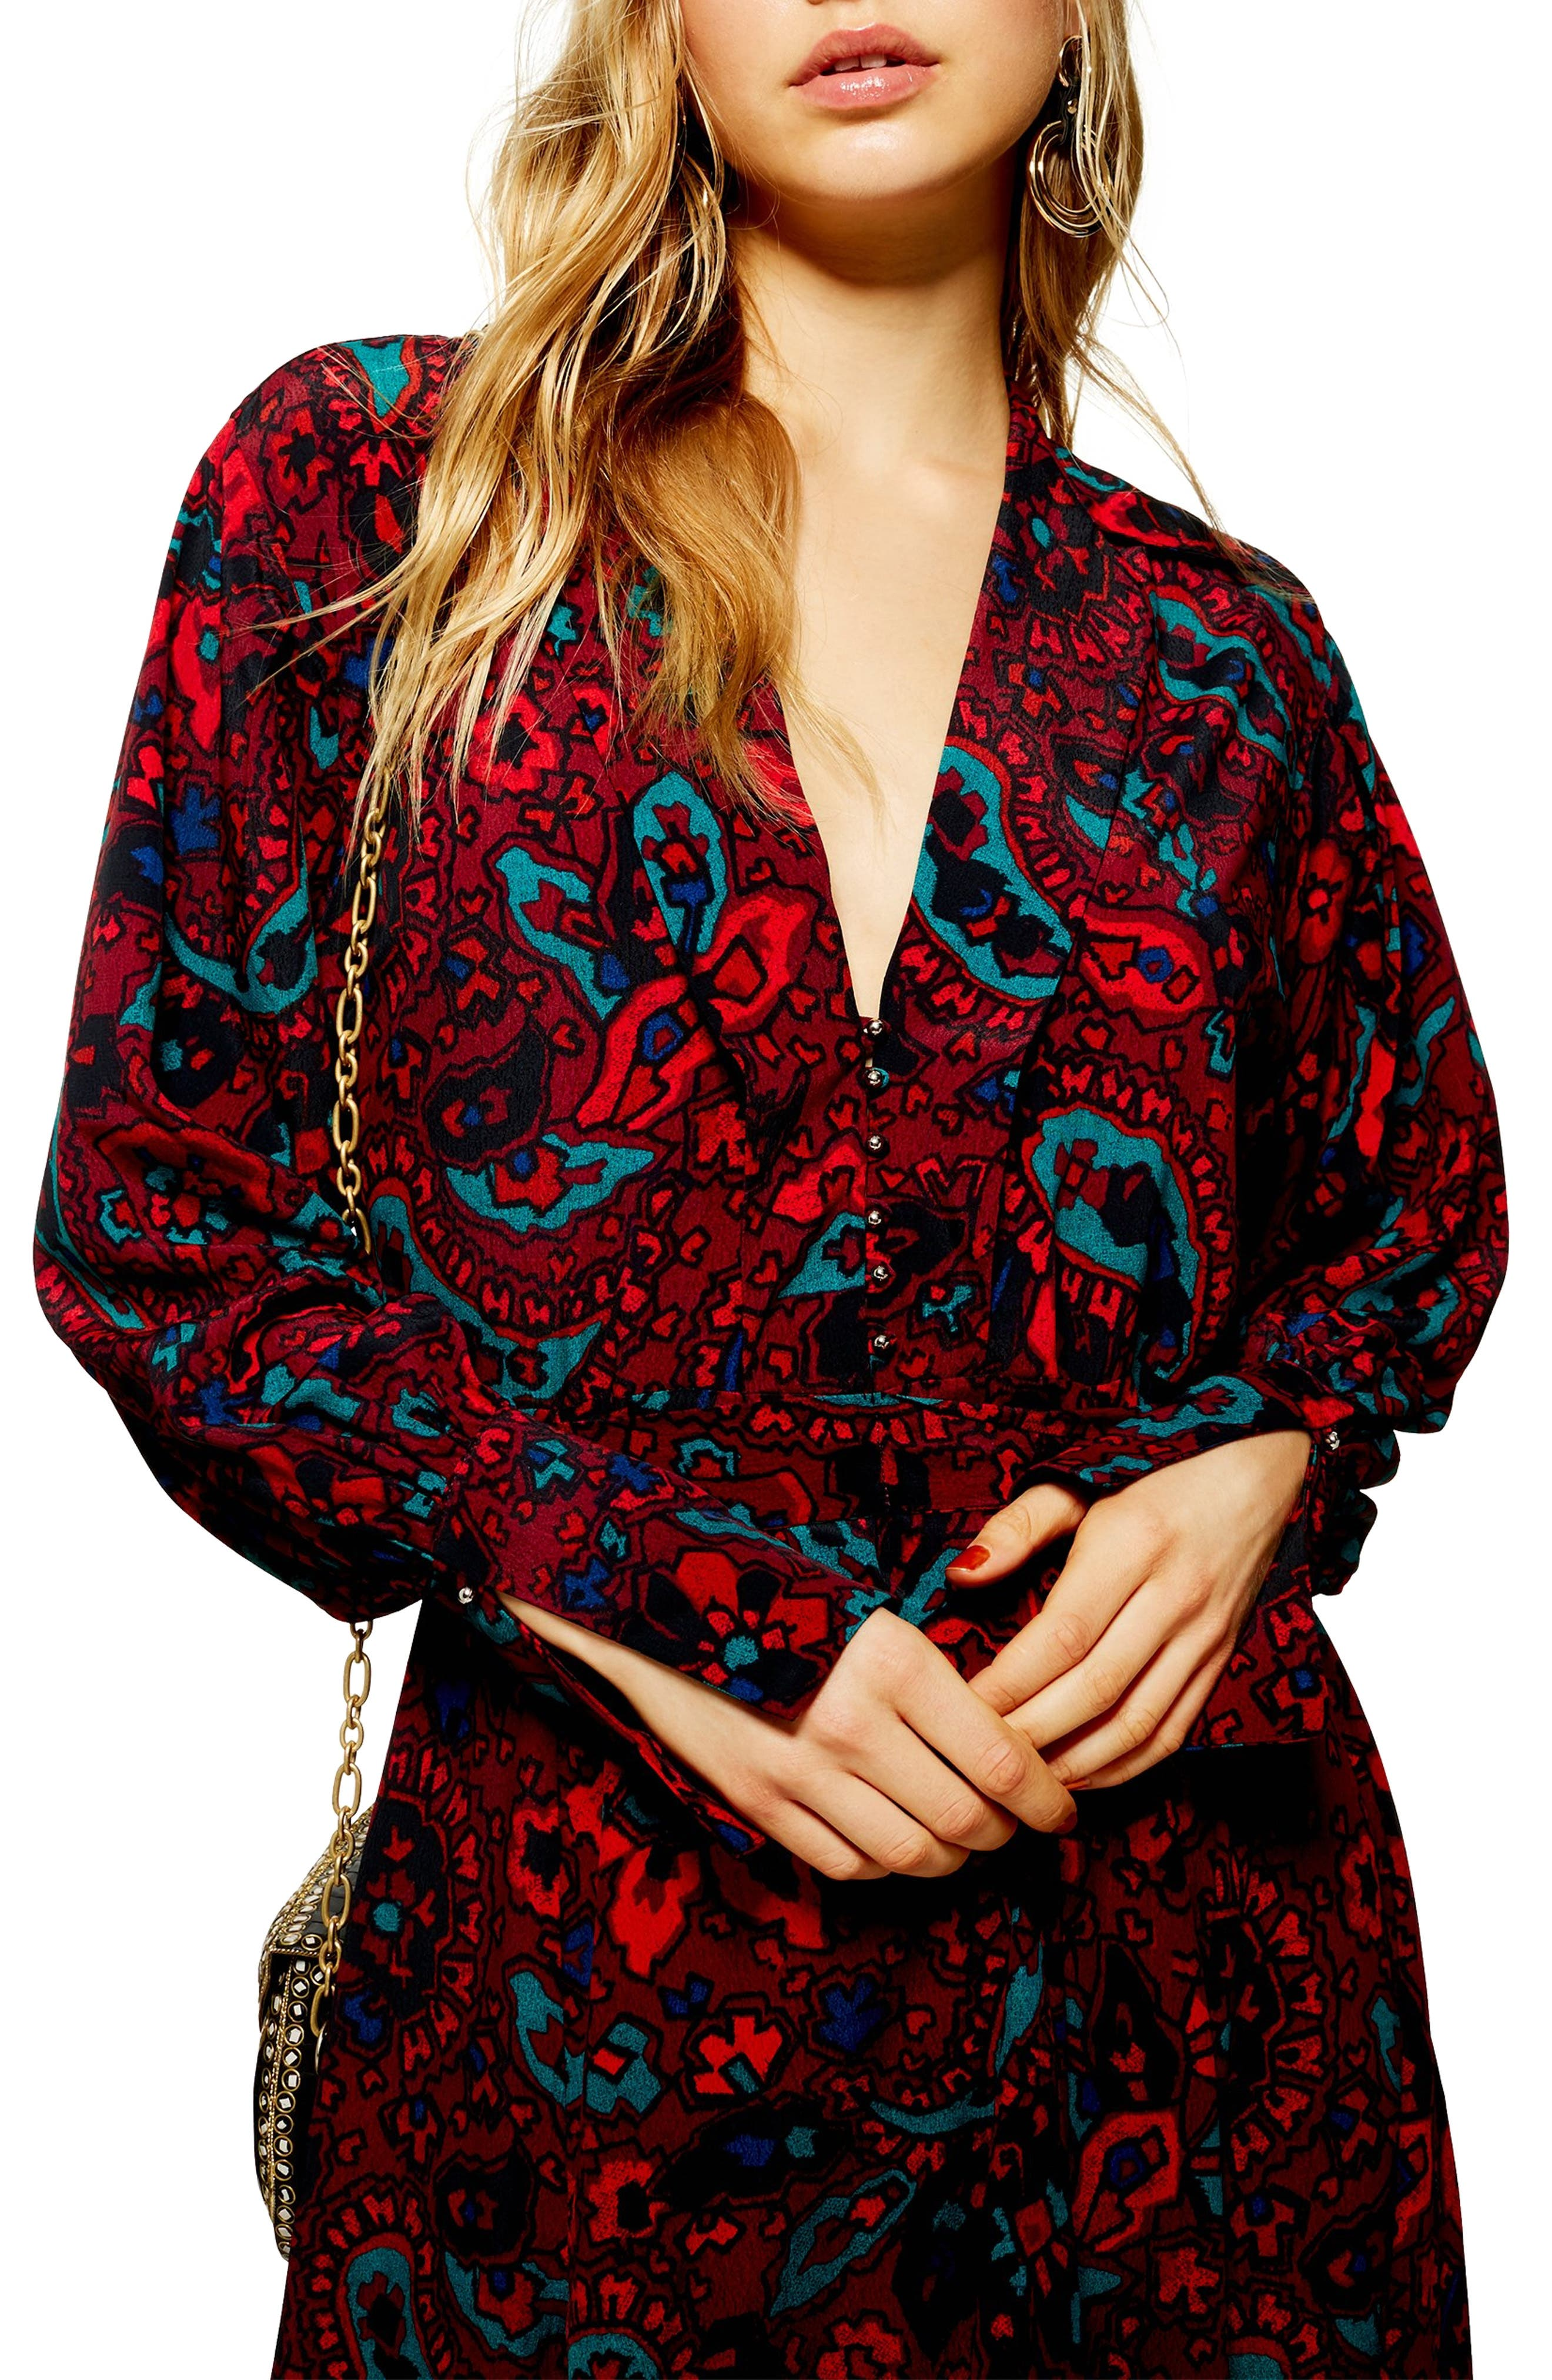 TOPSHOP, Paisley Oversize Shirtdress, Alternate thumbnail 4, color, 640